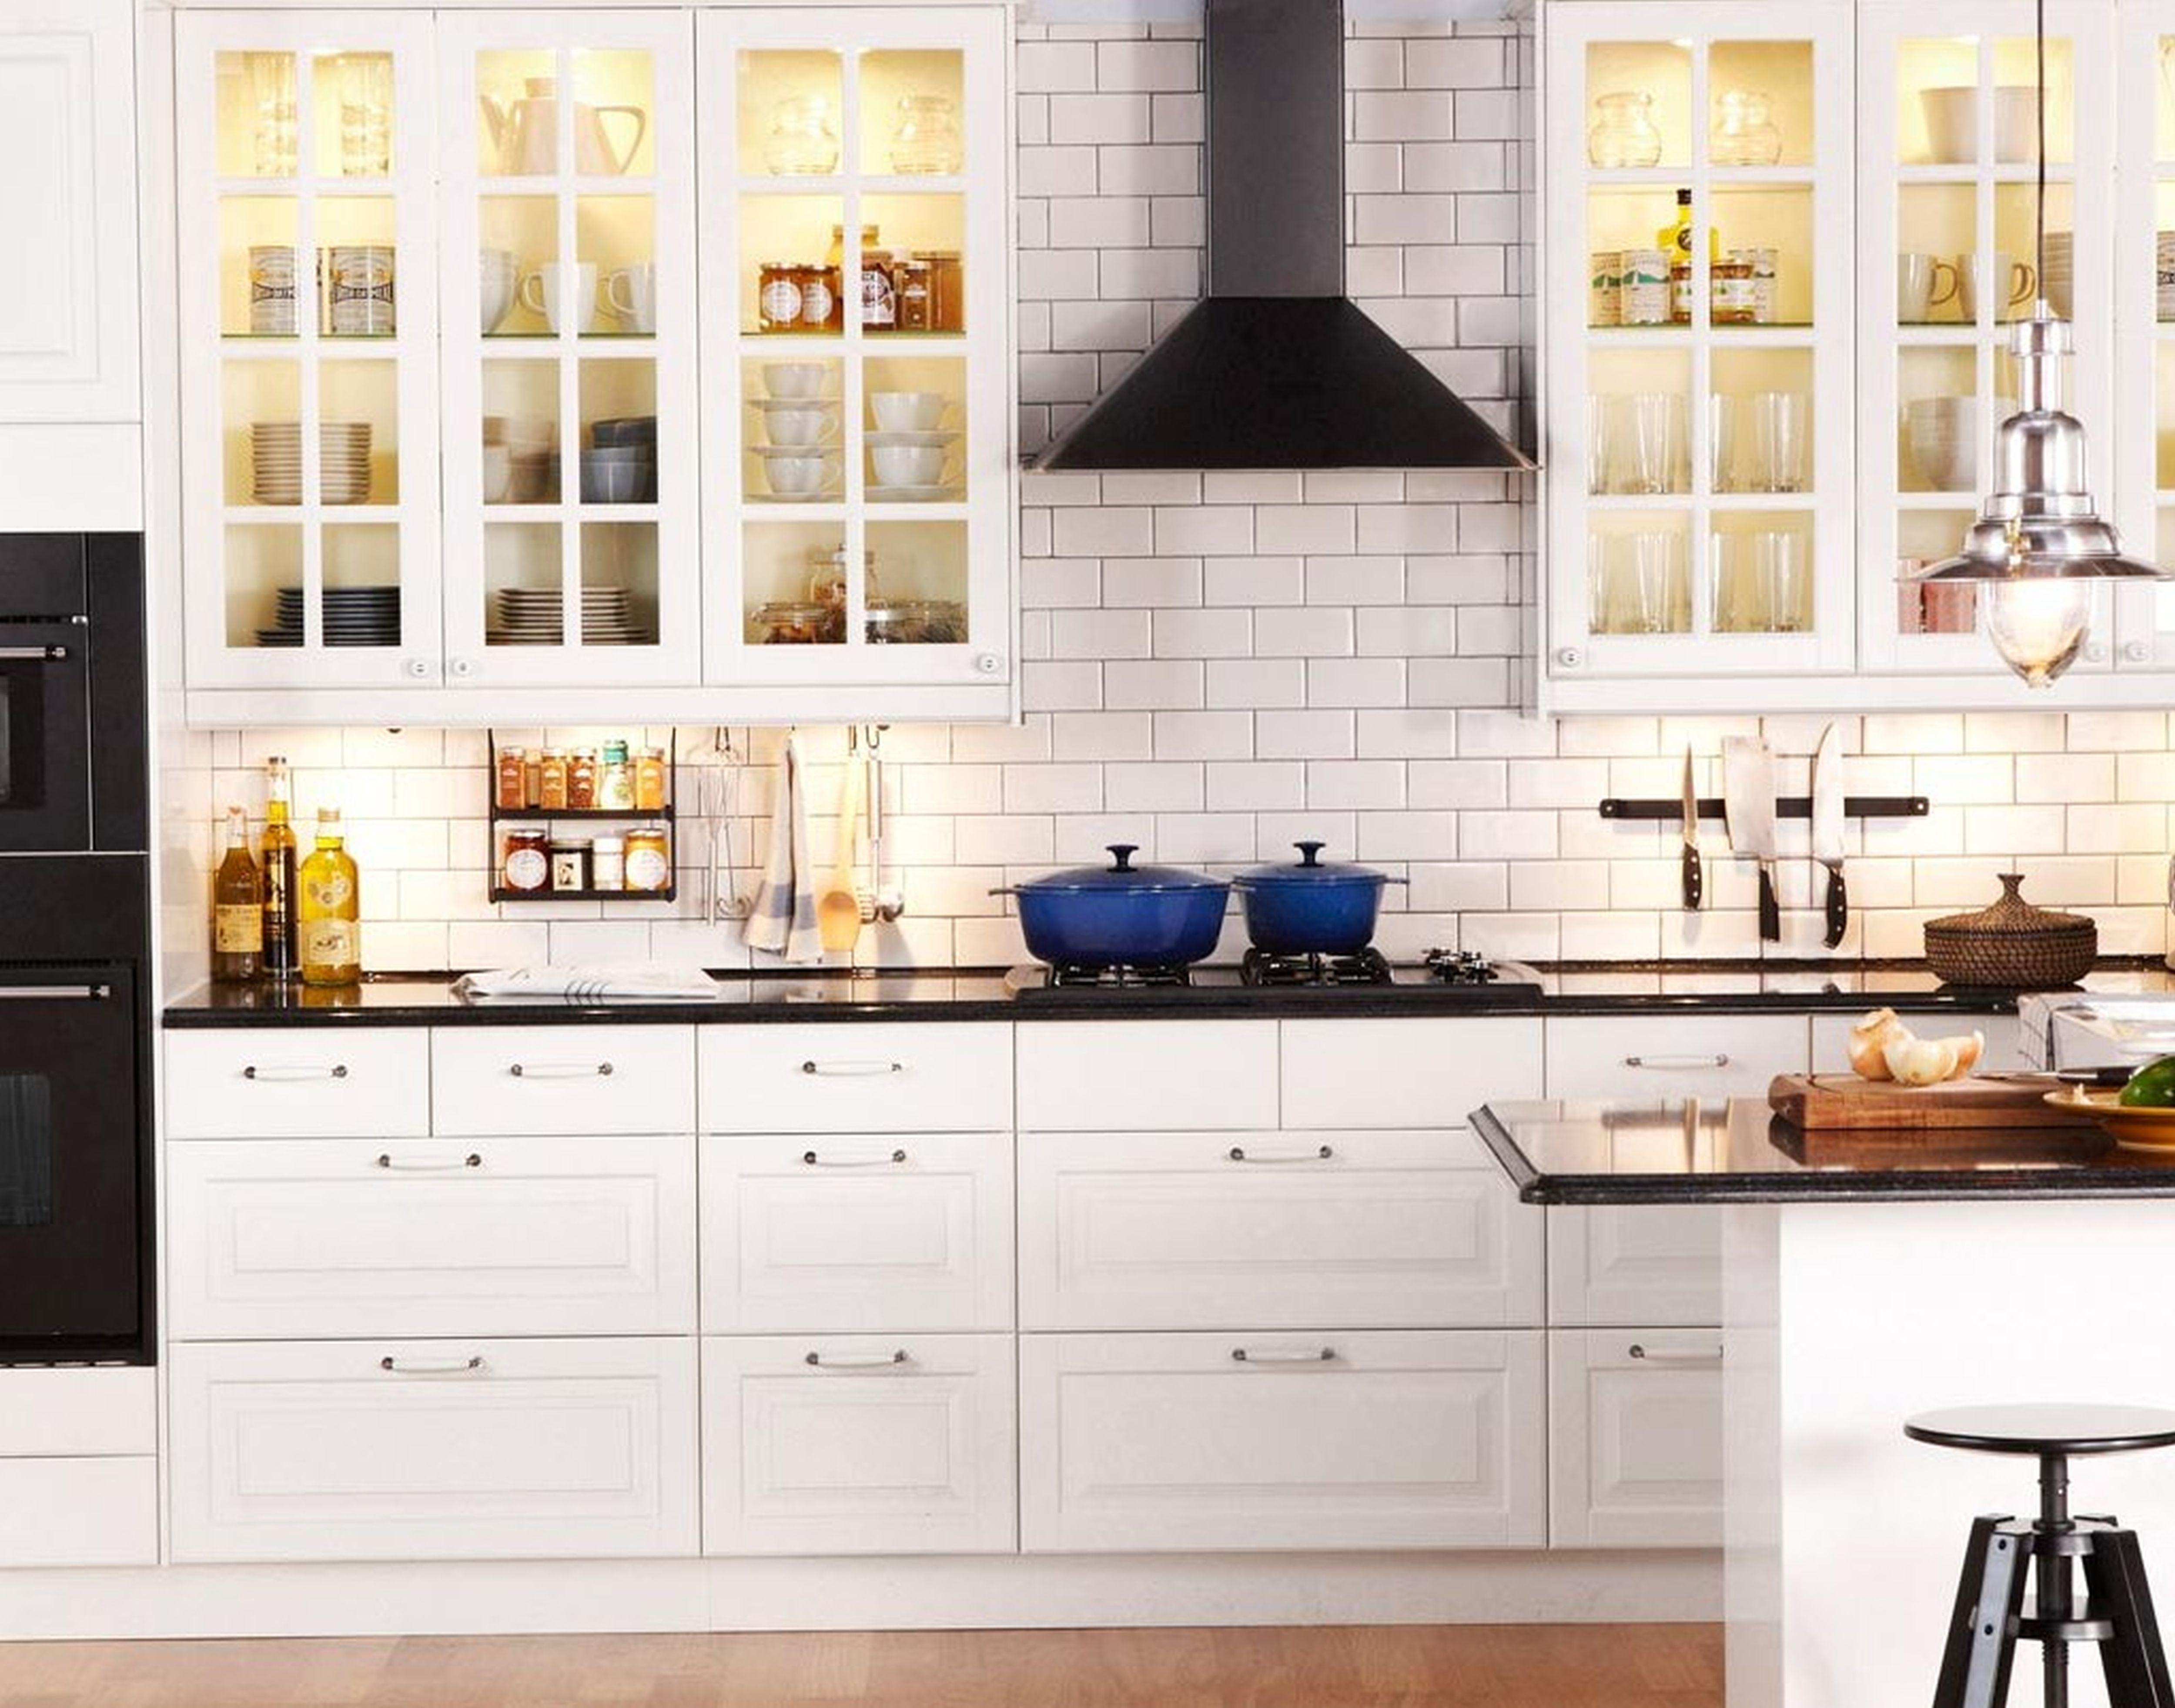 3d kitchen design app 3d kitchen design app for ipad 3d kitchen